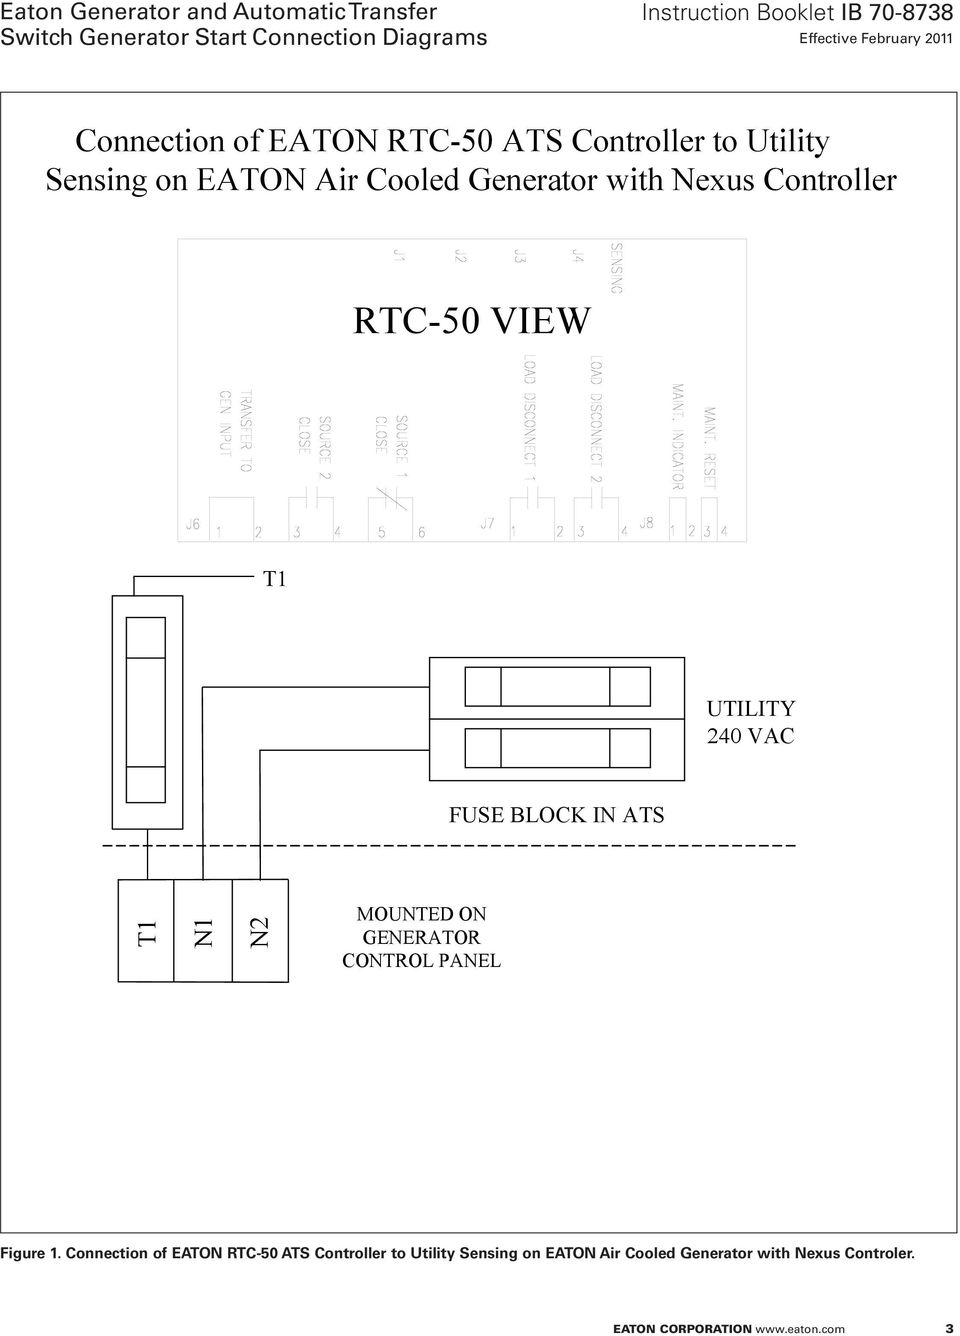 medium resolution of in ats n1 n2 mounted on generator control panel diagram 1 figure 1